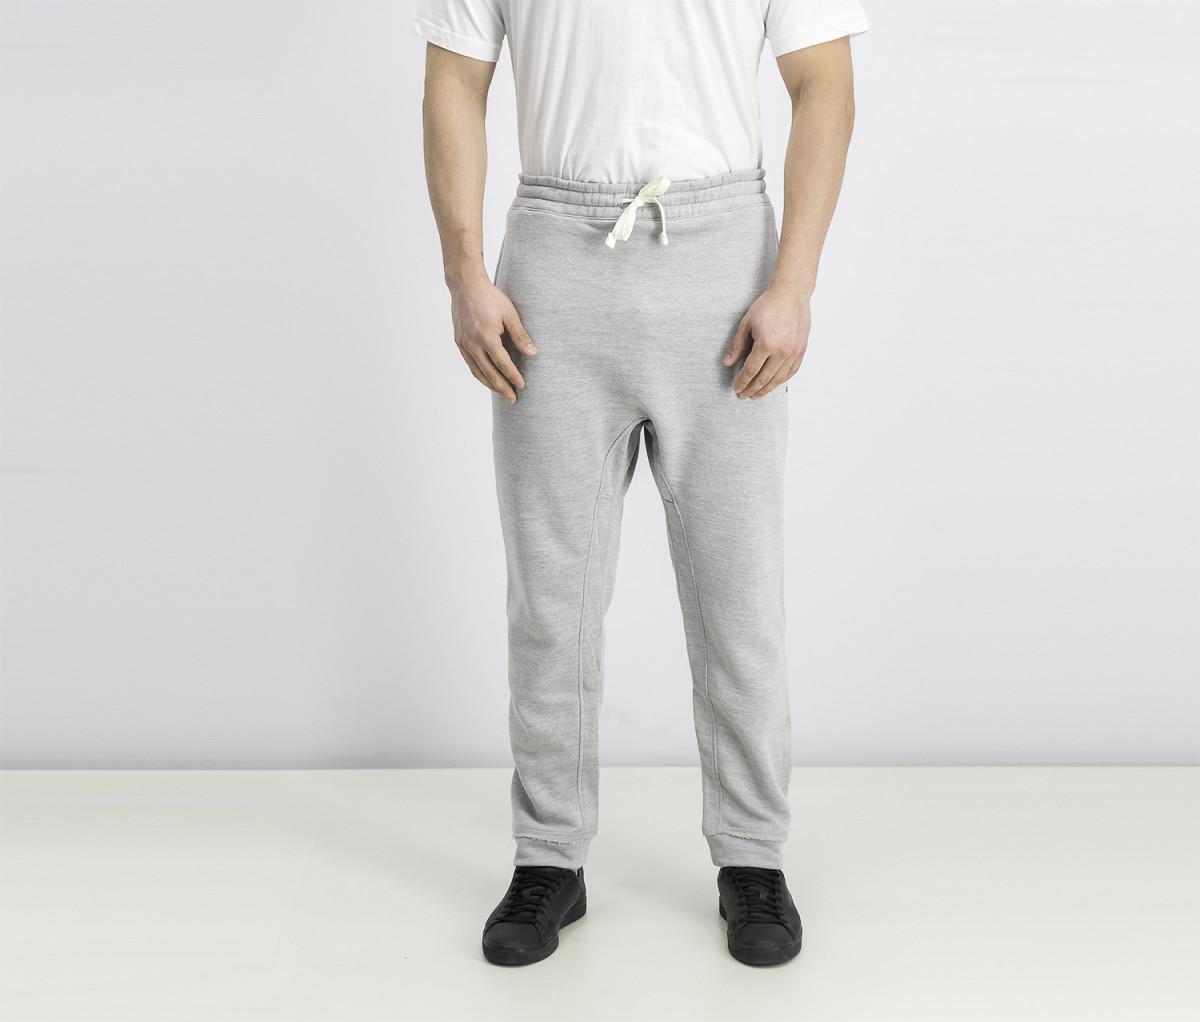 Reebok Mens Training Essentials Marble Pants  Grey